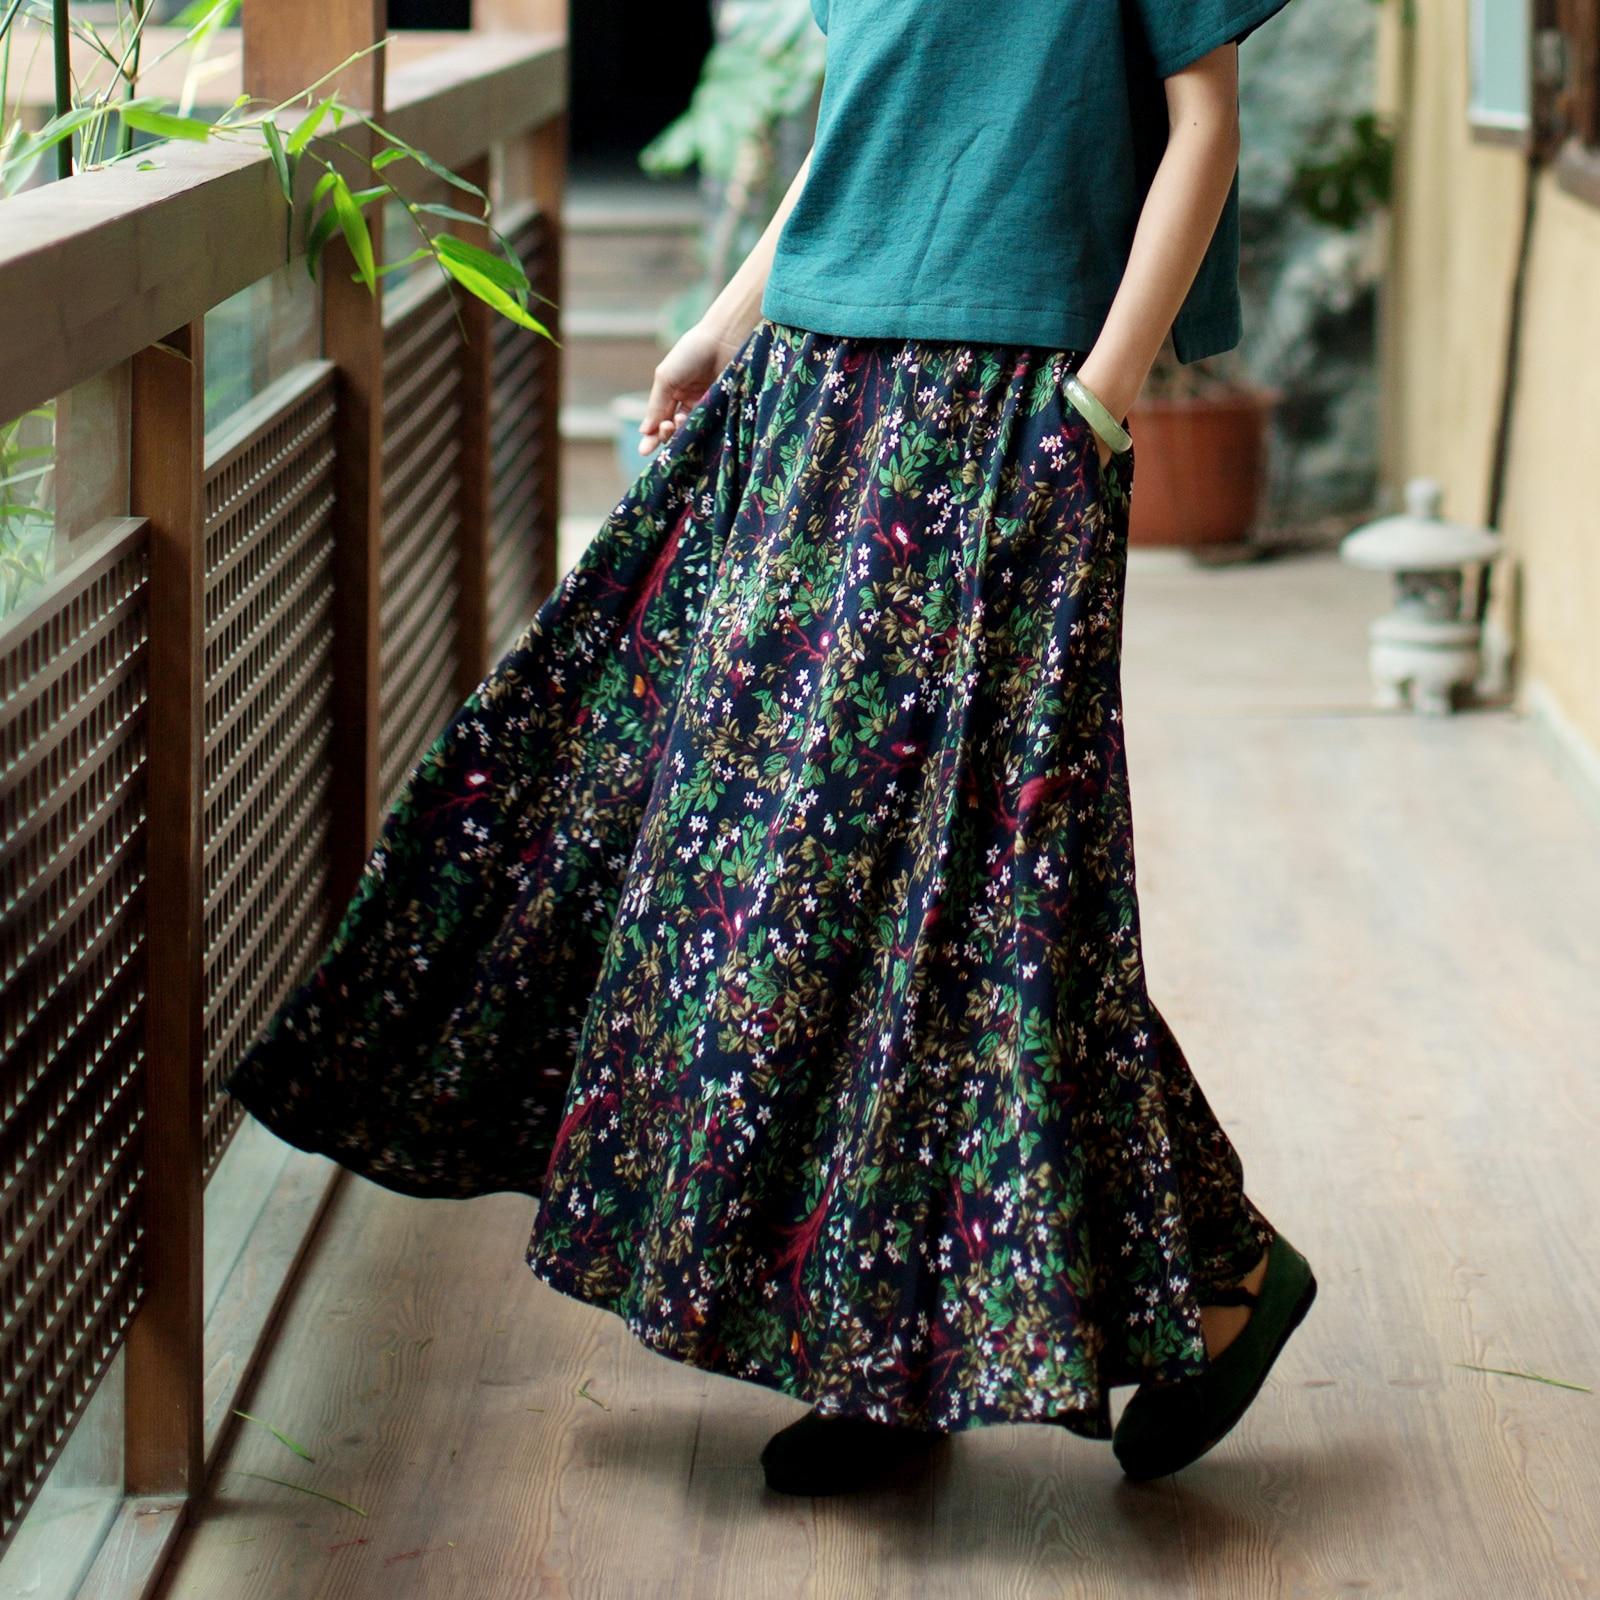 Summer New Long Beautiful Floral Large Hem Women Cotton Linen Skirt Trendy Ethnic Colorful Flowers Novelty